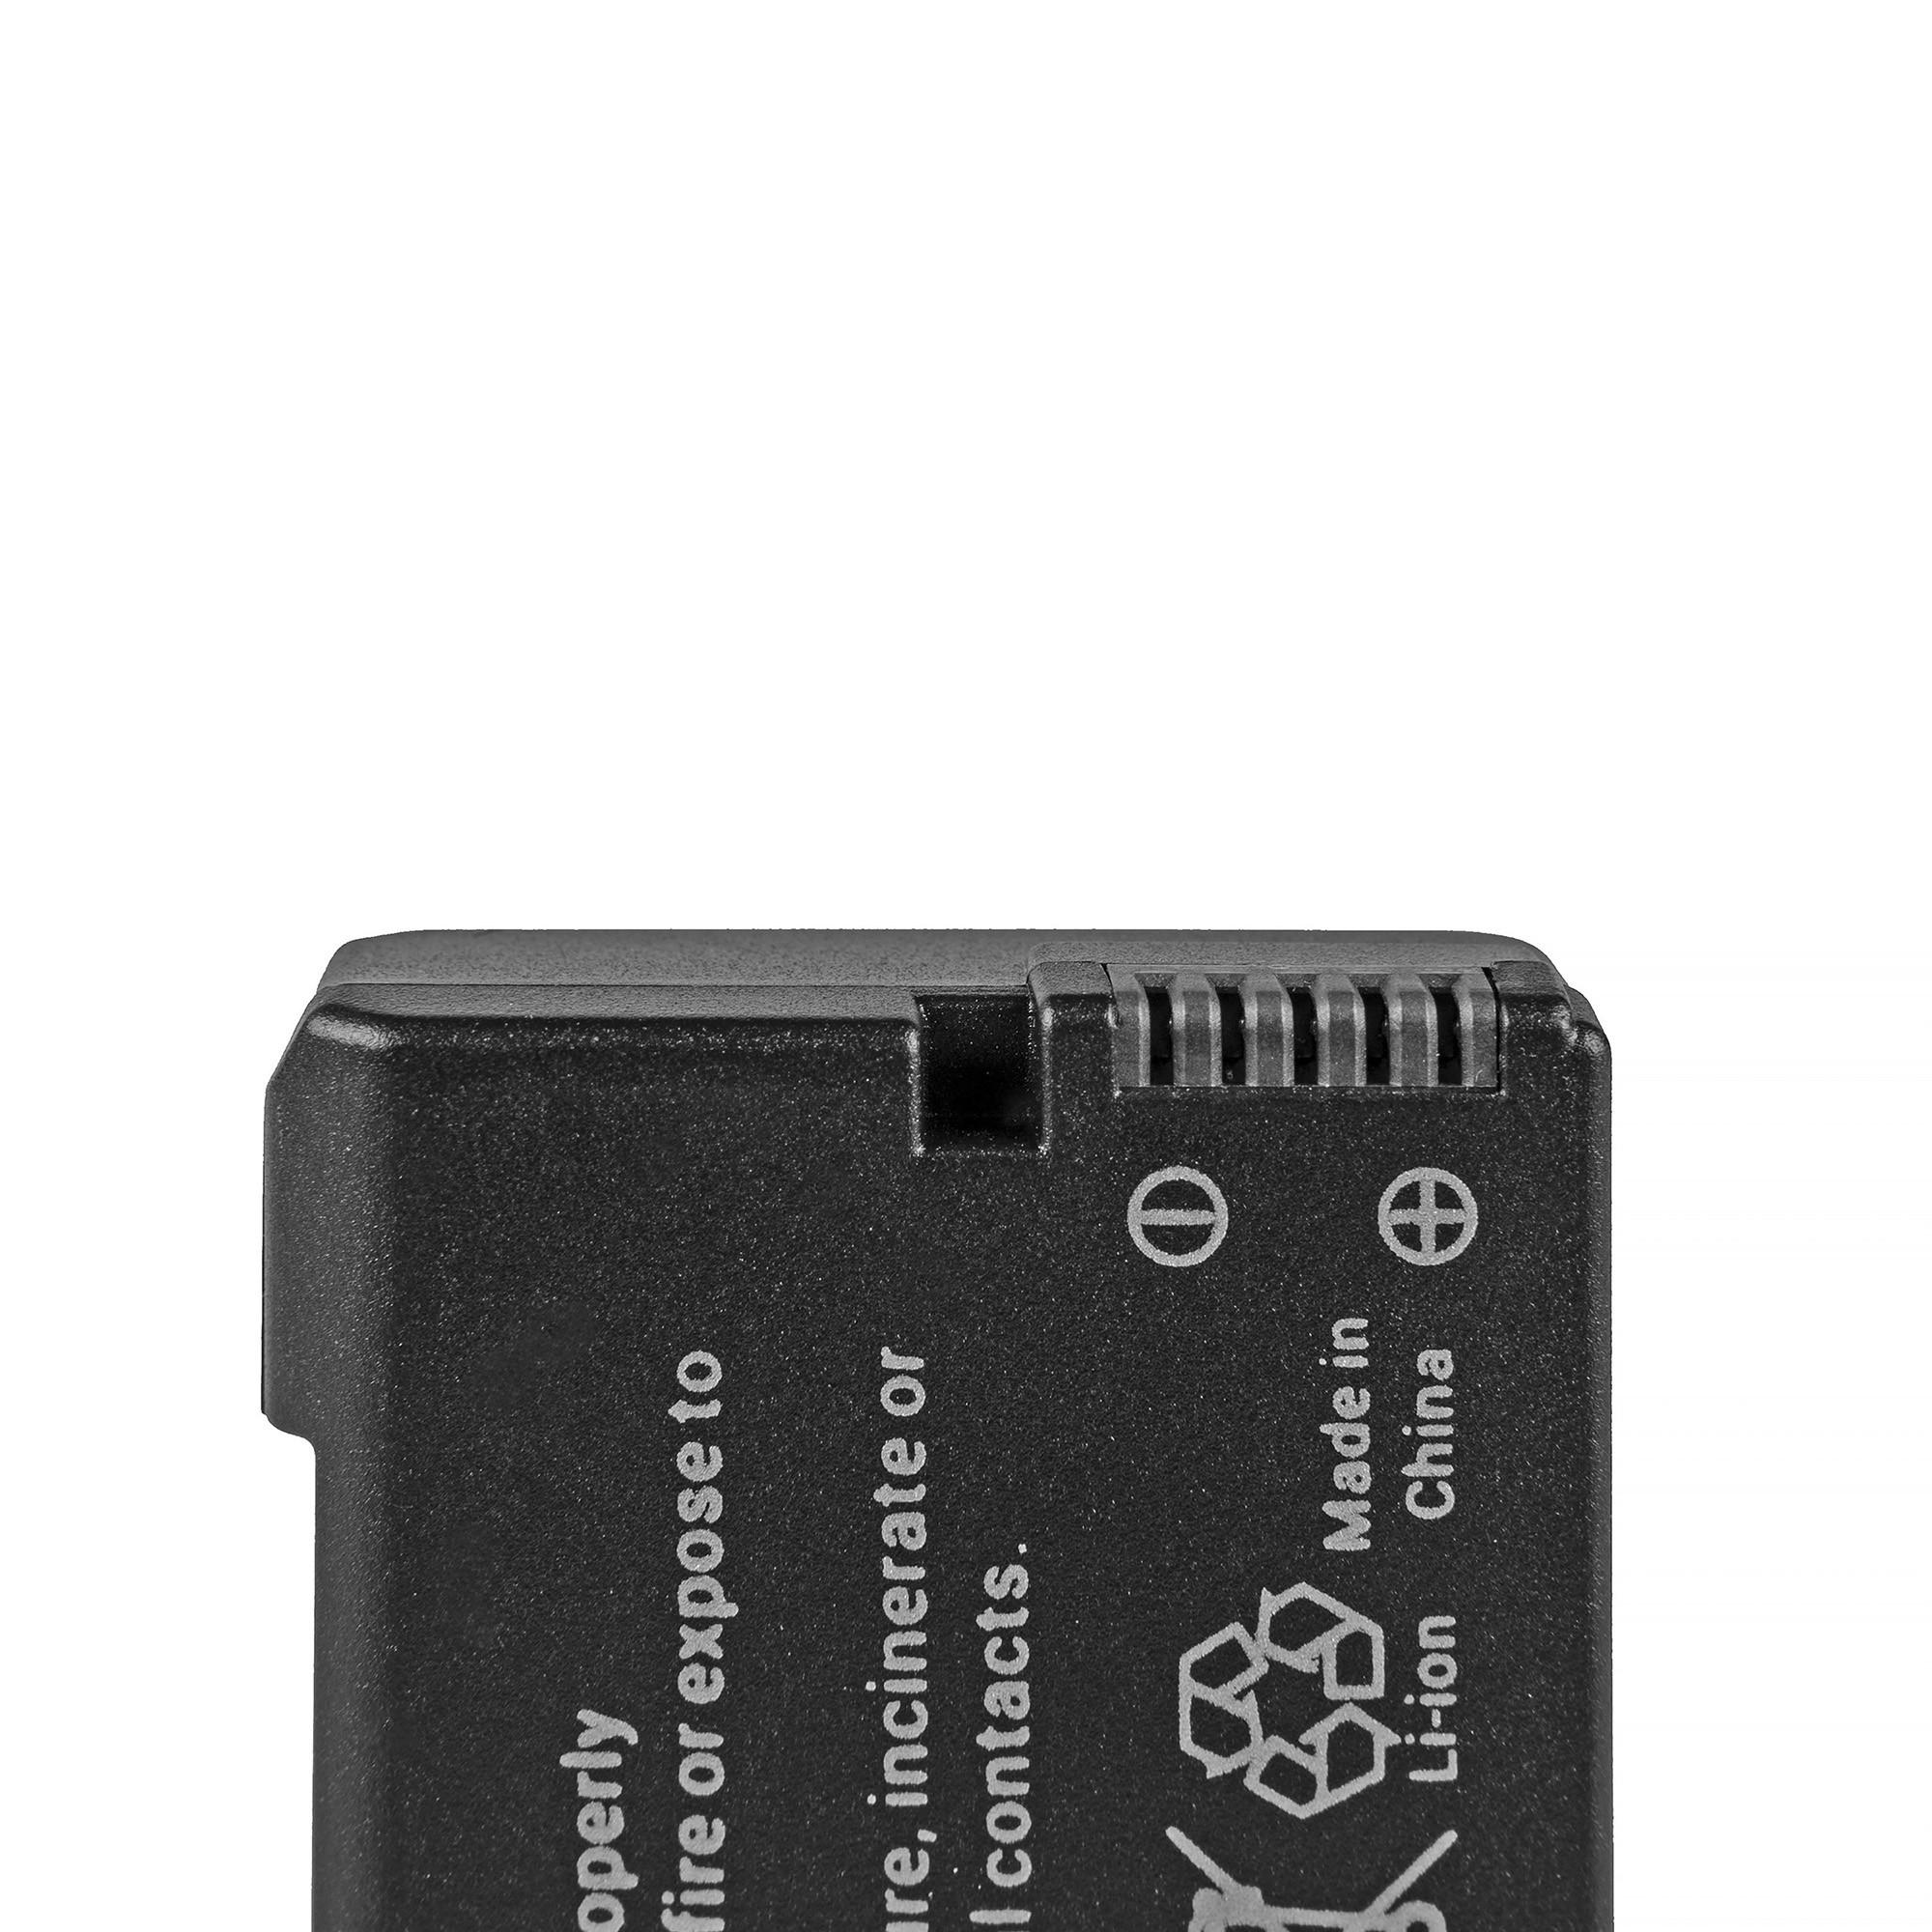 Baterie Green Cell Nikon EN-EL14 Nikon D3200,D3300,D5100,D5200,D5300,D5500,Coolpix P7000,P7700,P7800 1100mAh Li-ion - neoriginální